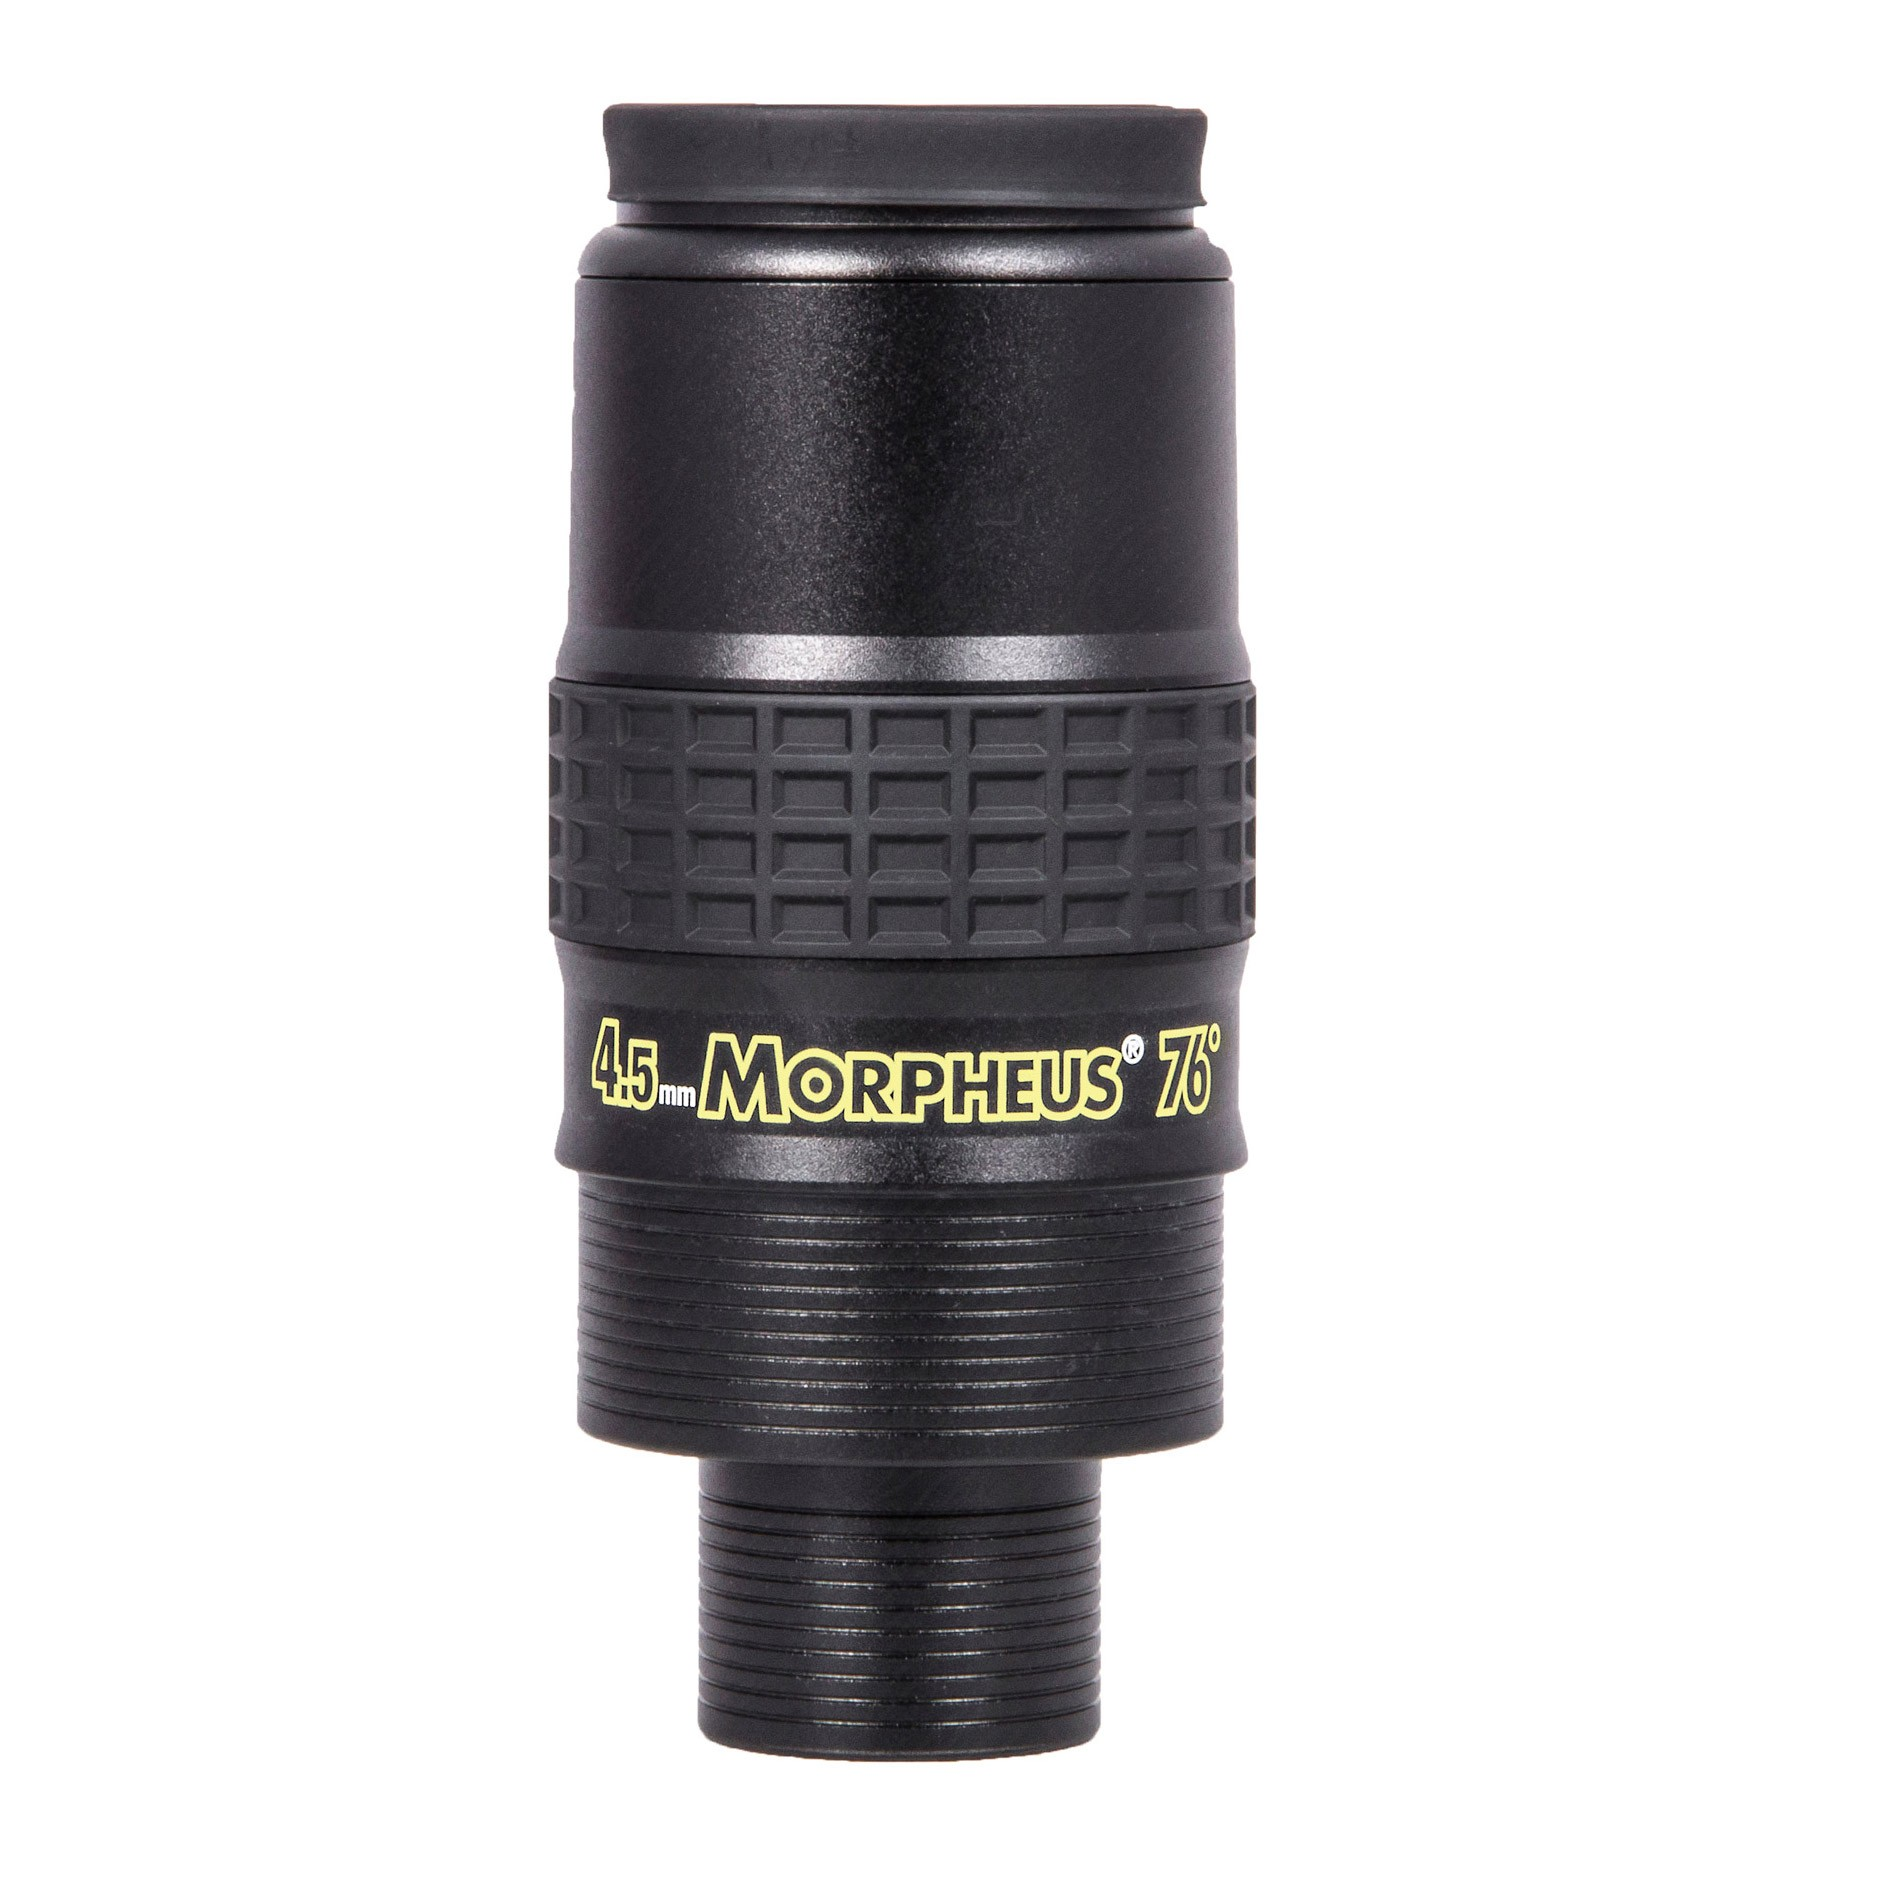 4,5 mm Morpheus 76° widefield eyepiece